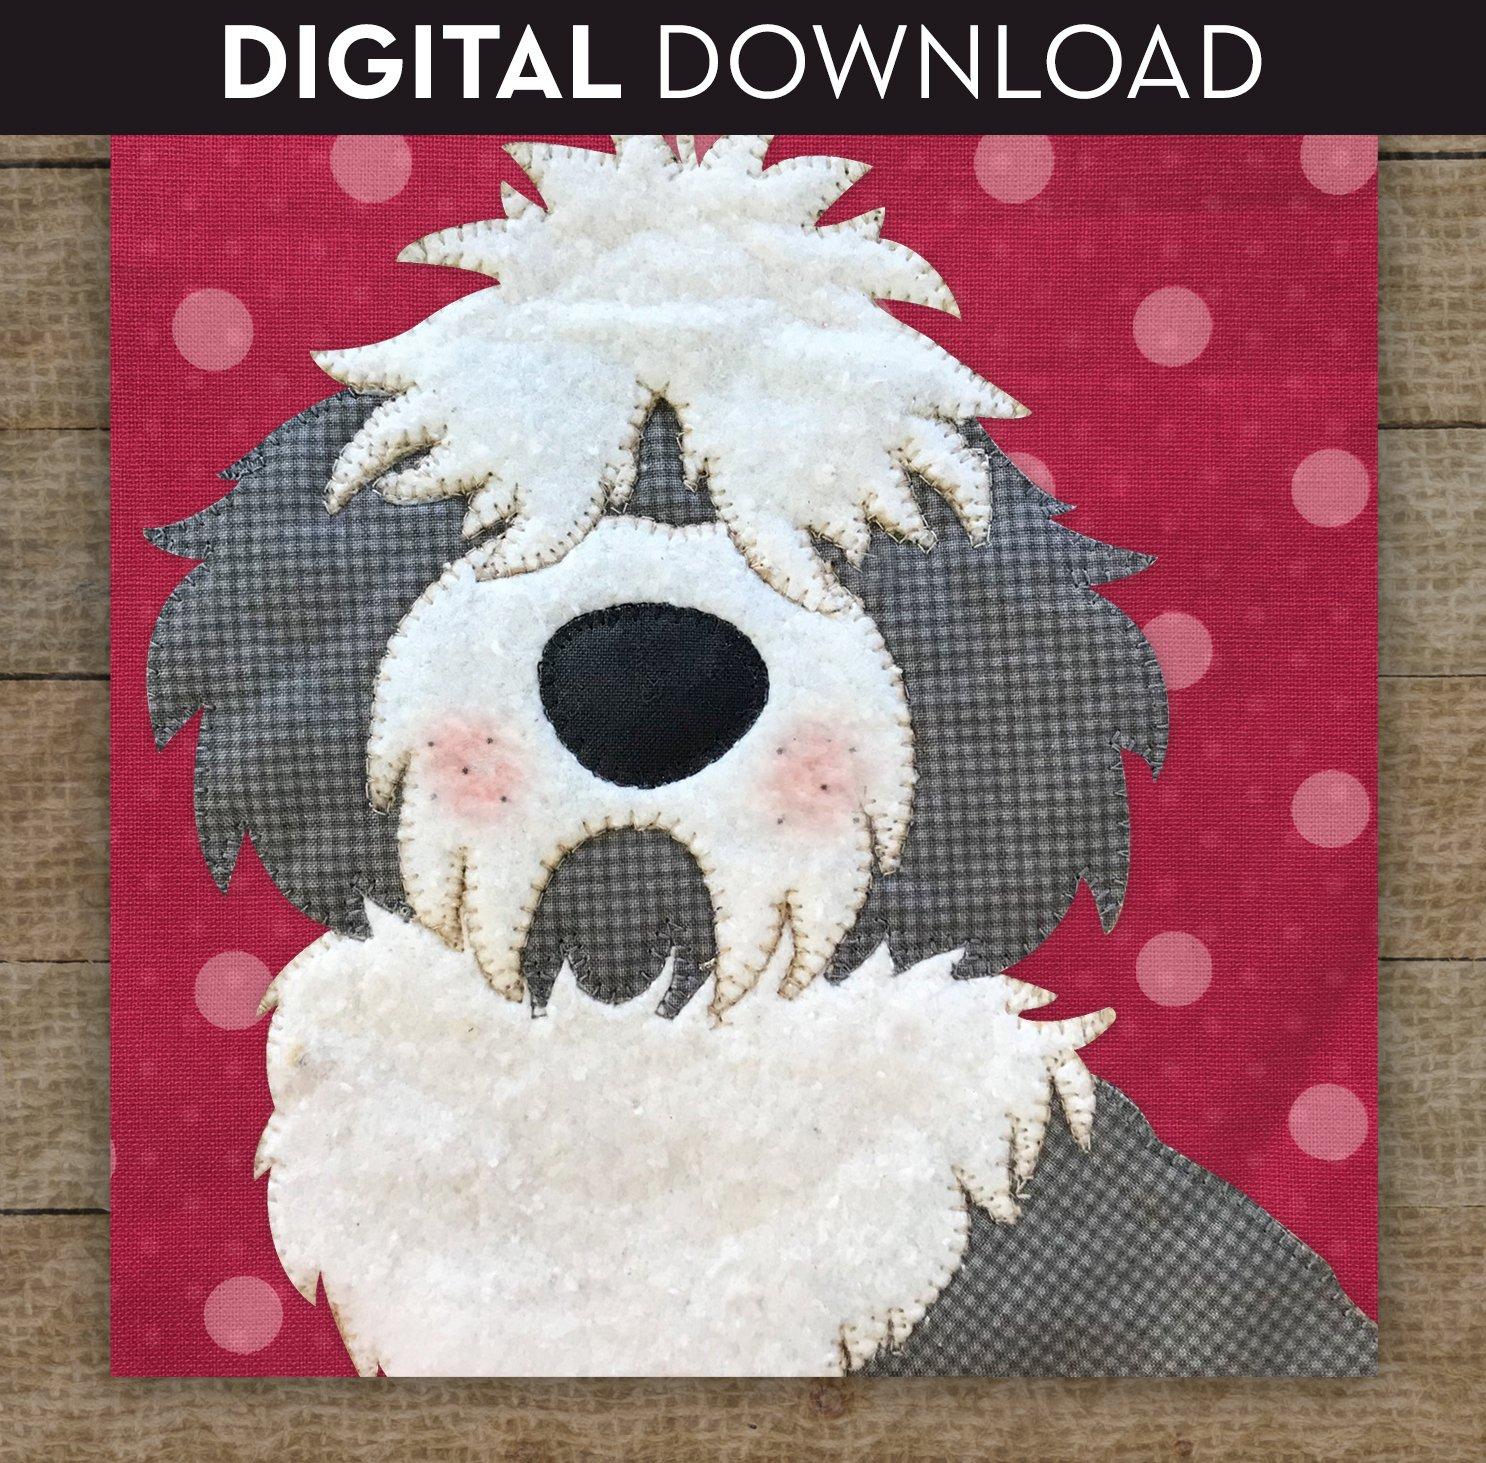 Sheepdog - Download